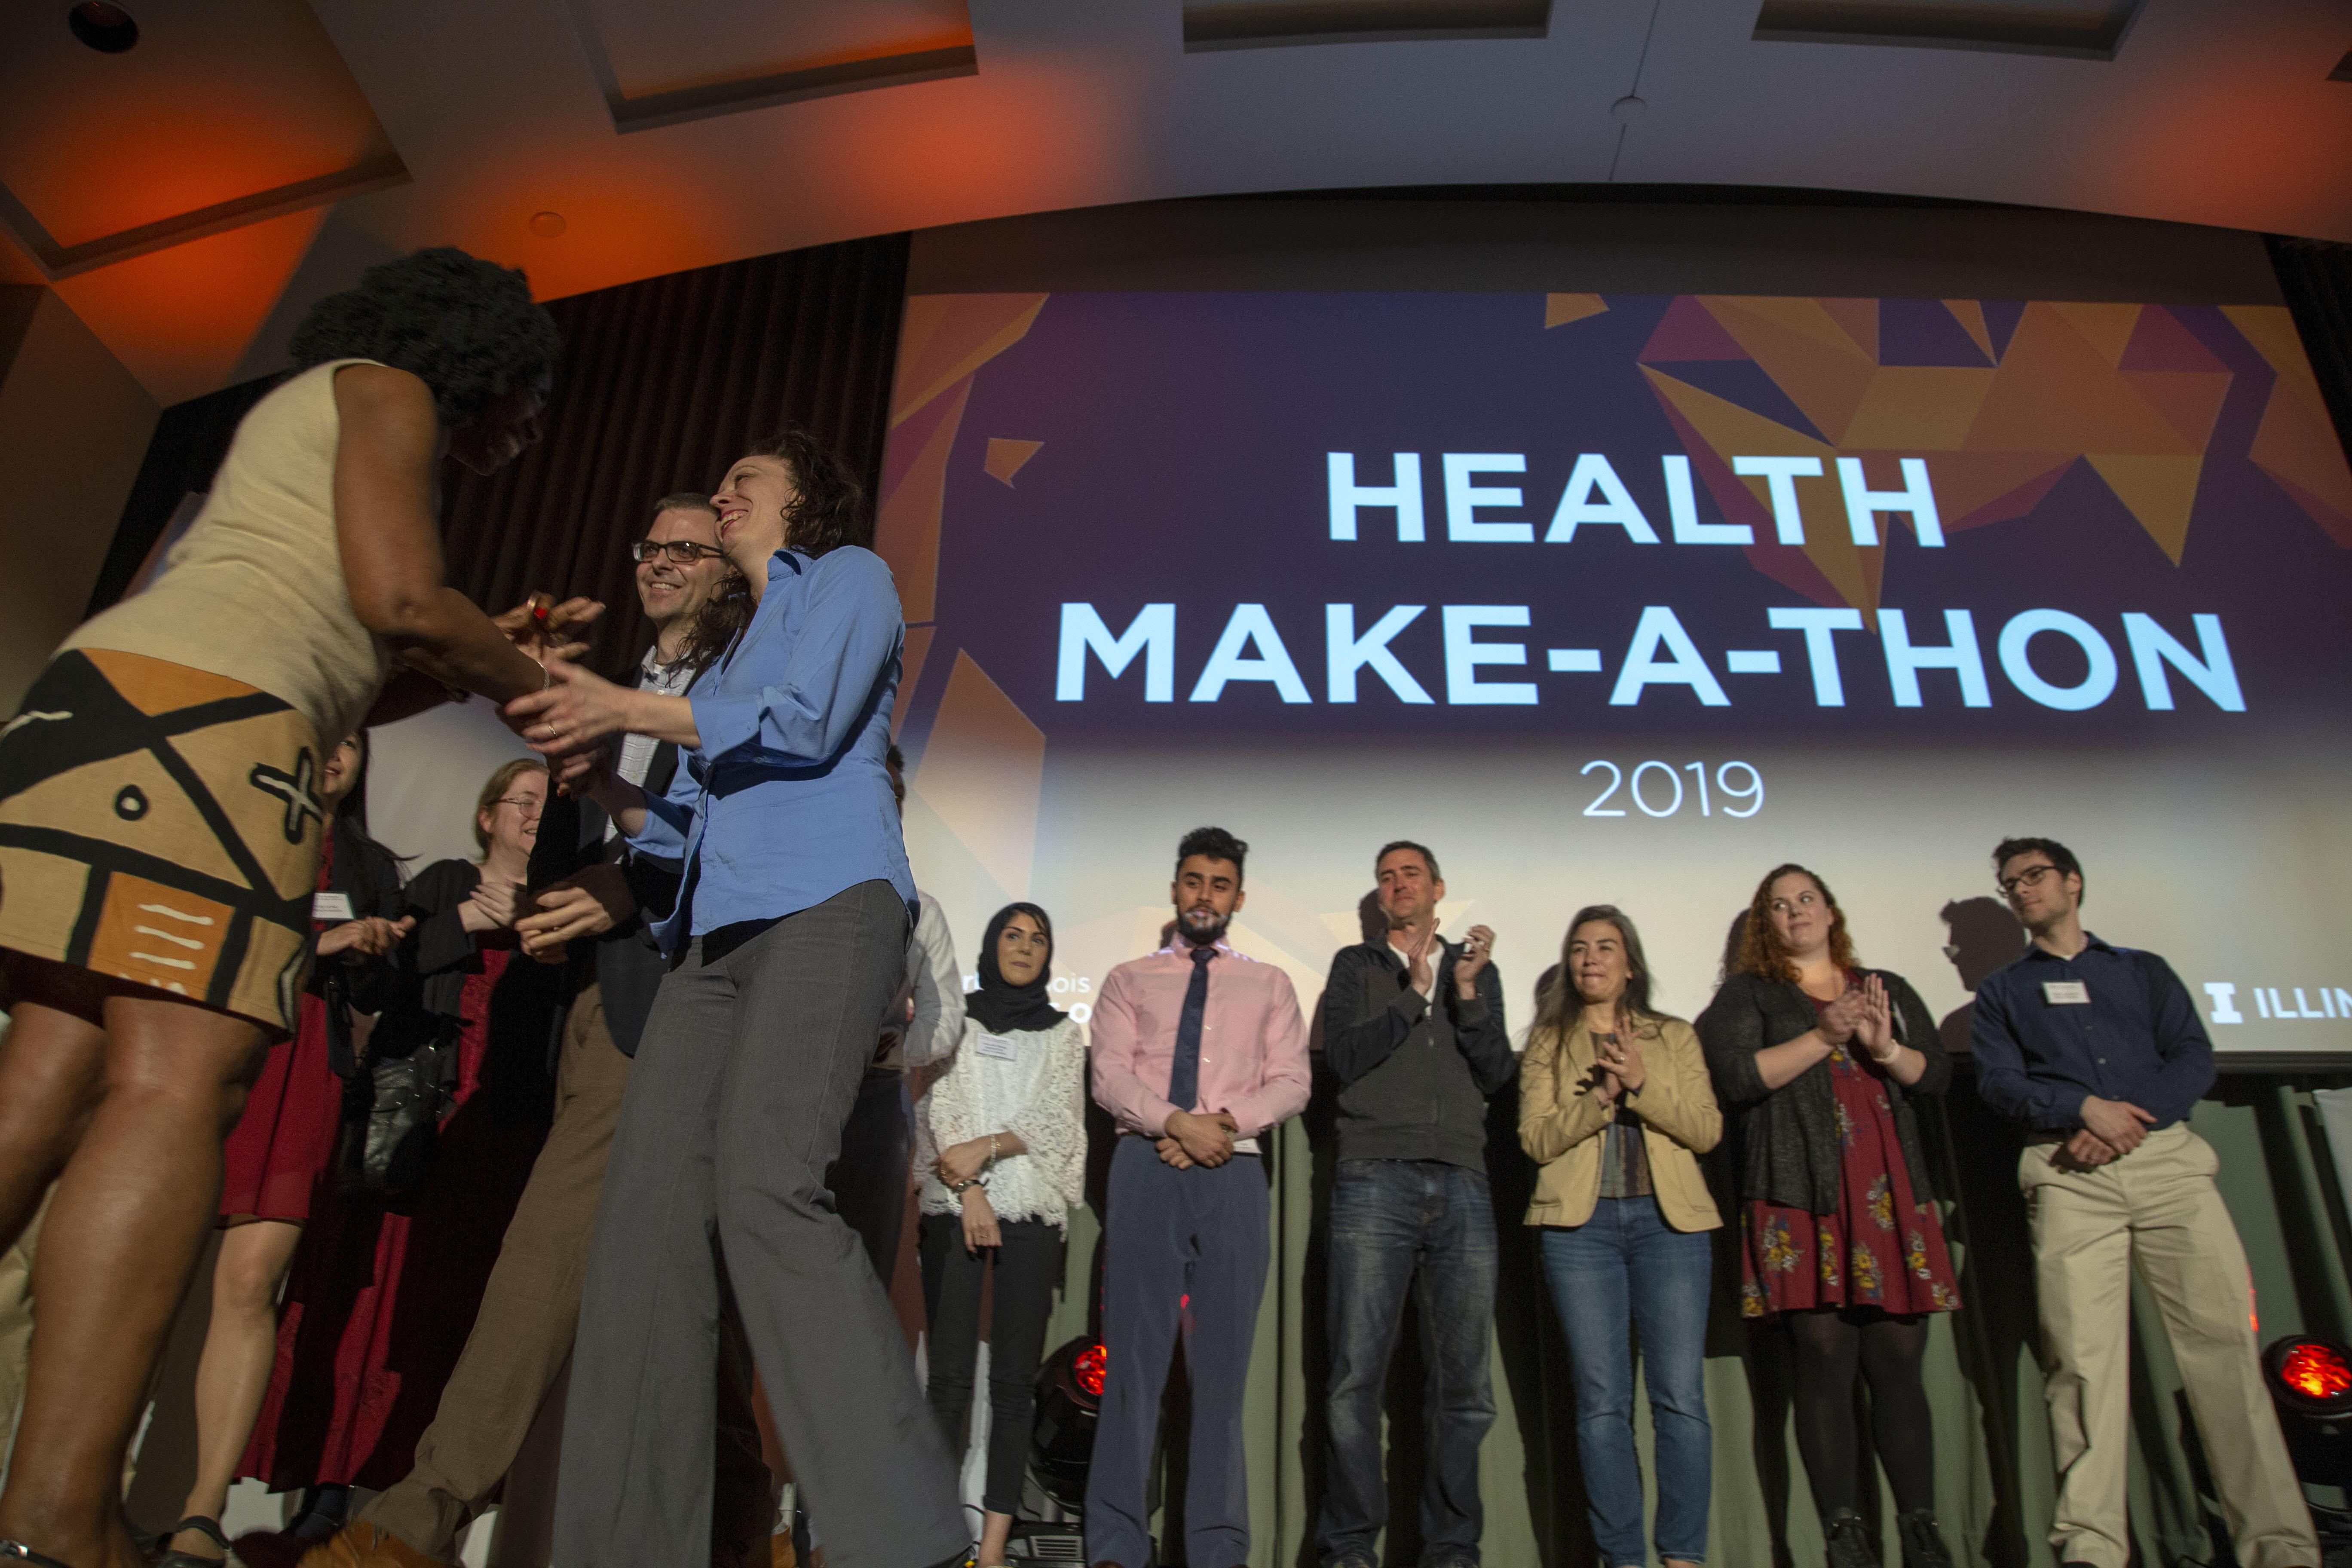 One Health Make-a-Thon winner, Sarah Nixon, receiving her Health Maker Lab coin.